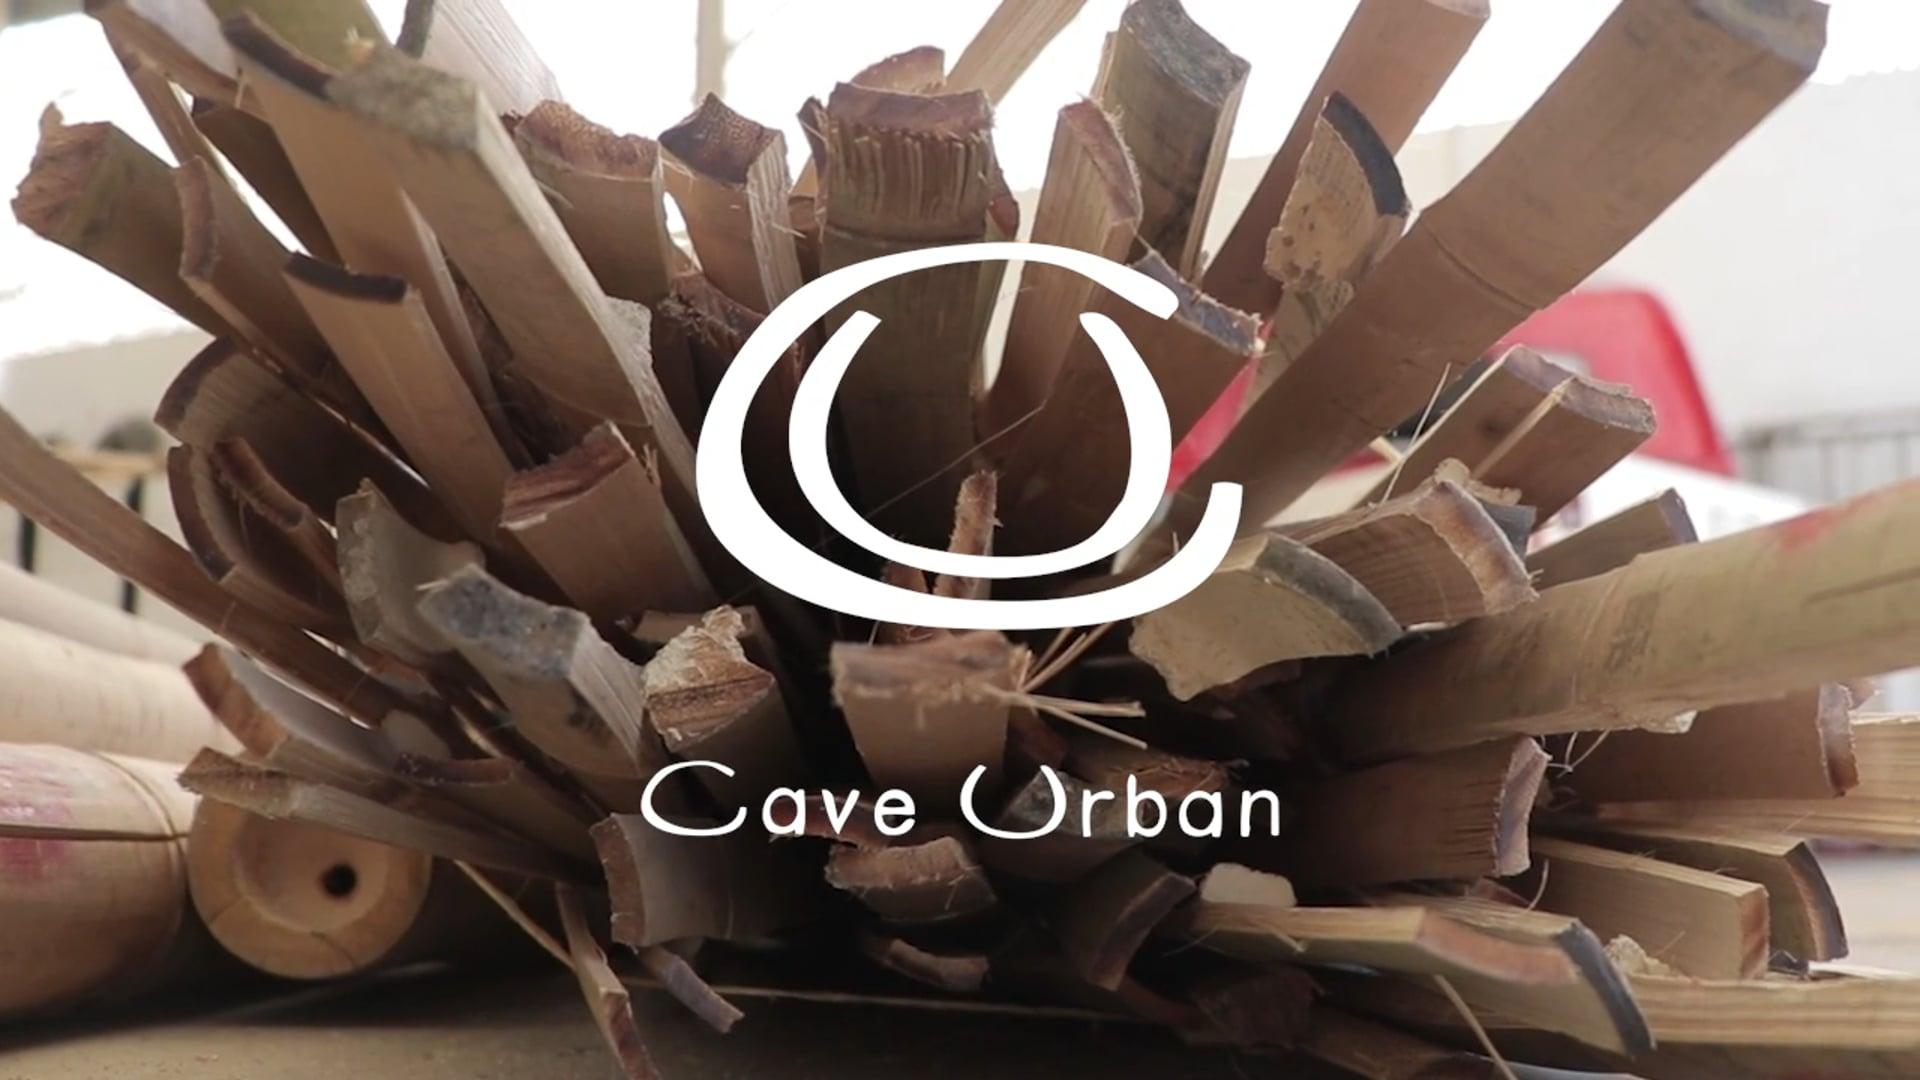 Dicma Trade   Cave Urban   Jed Long & Peter Van Lengen